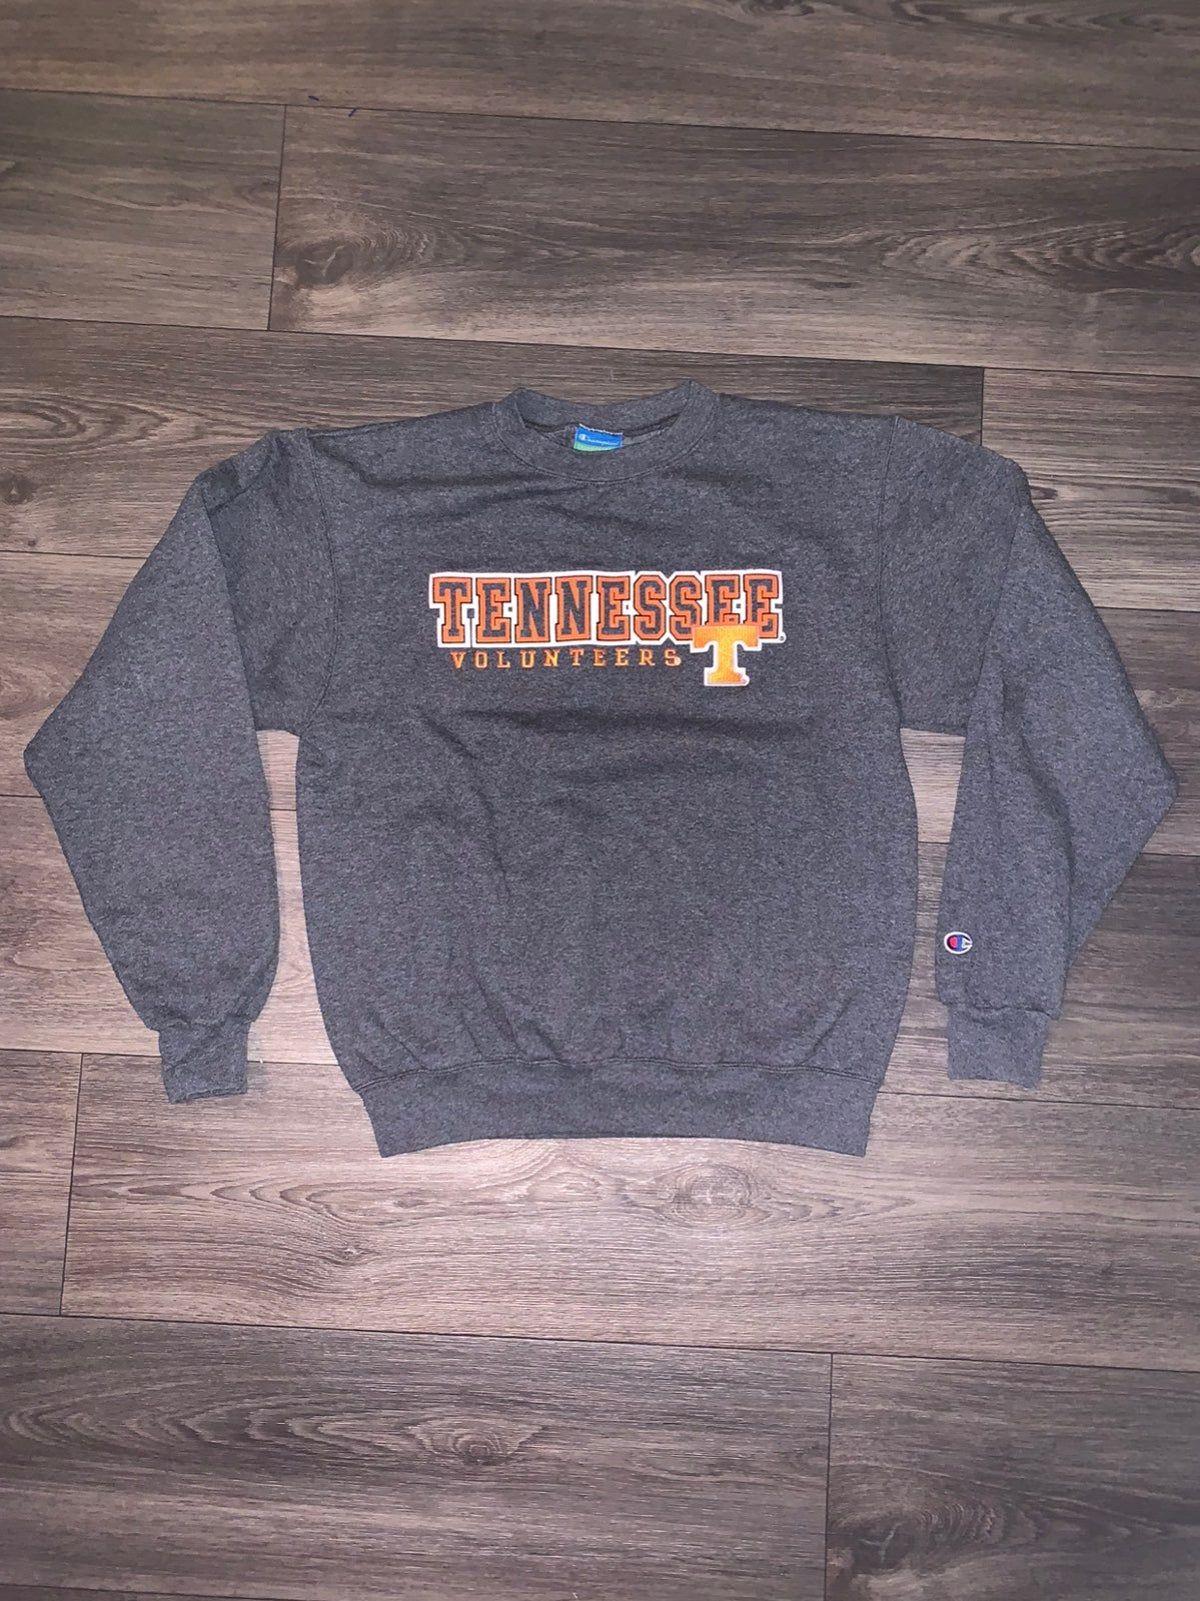 Pin By Emily Alam On Tennessee Volunteers In 2020 Vintage Champion Tennesse Volunteers Crew Neck Sweatshirt [ 1601 x 1200 Pixel ]